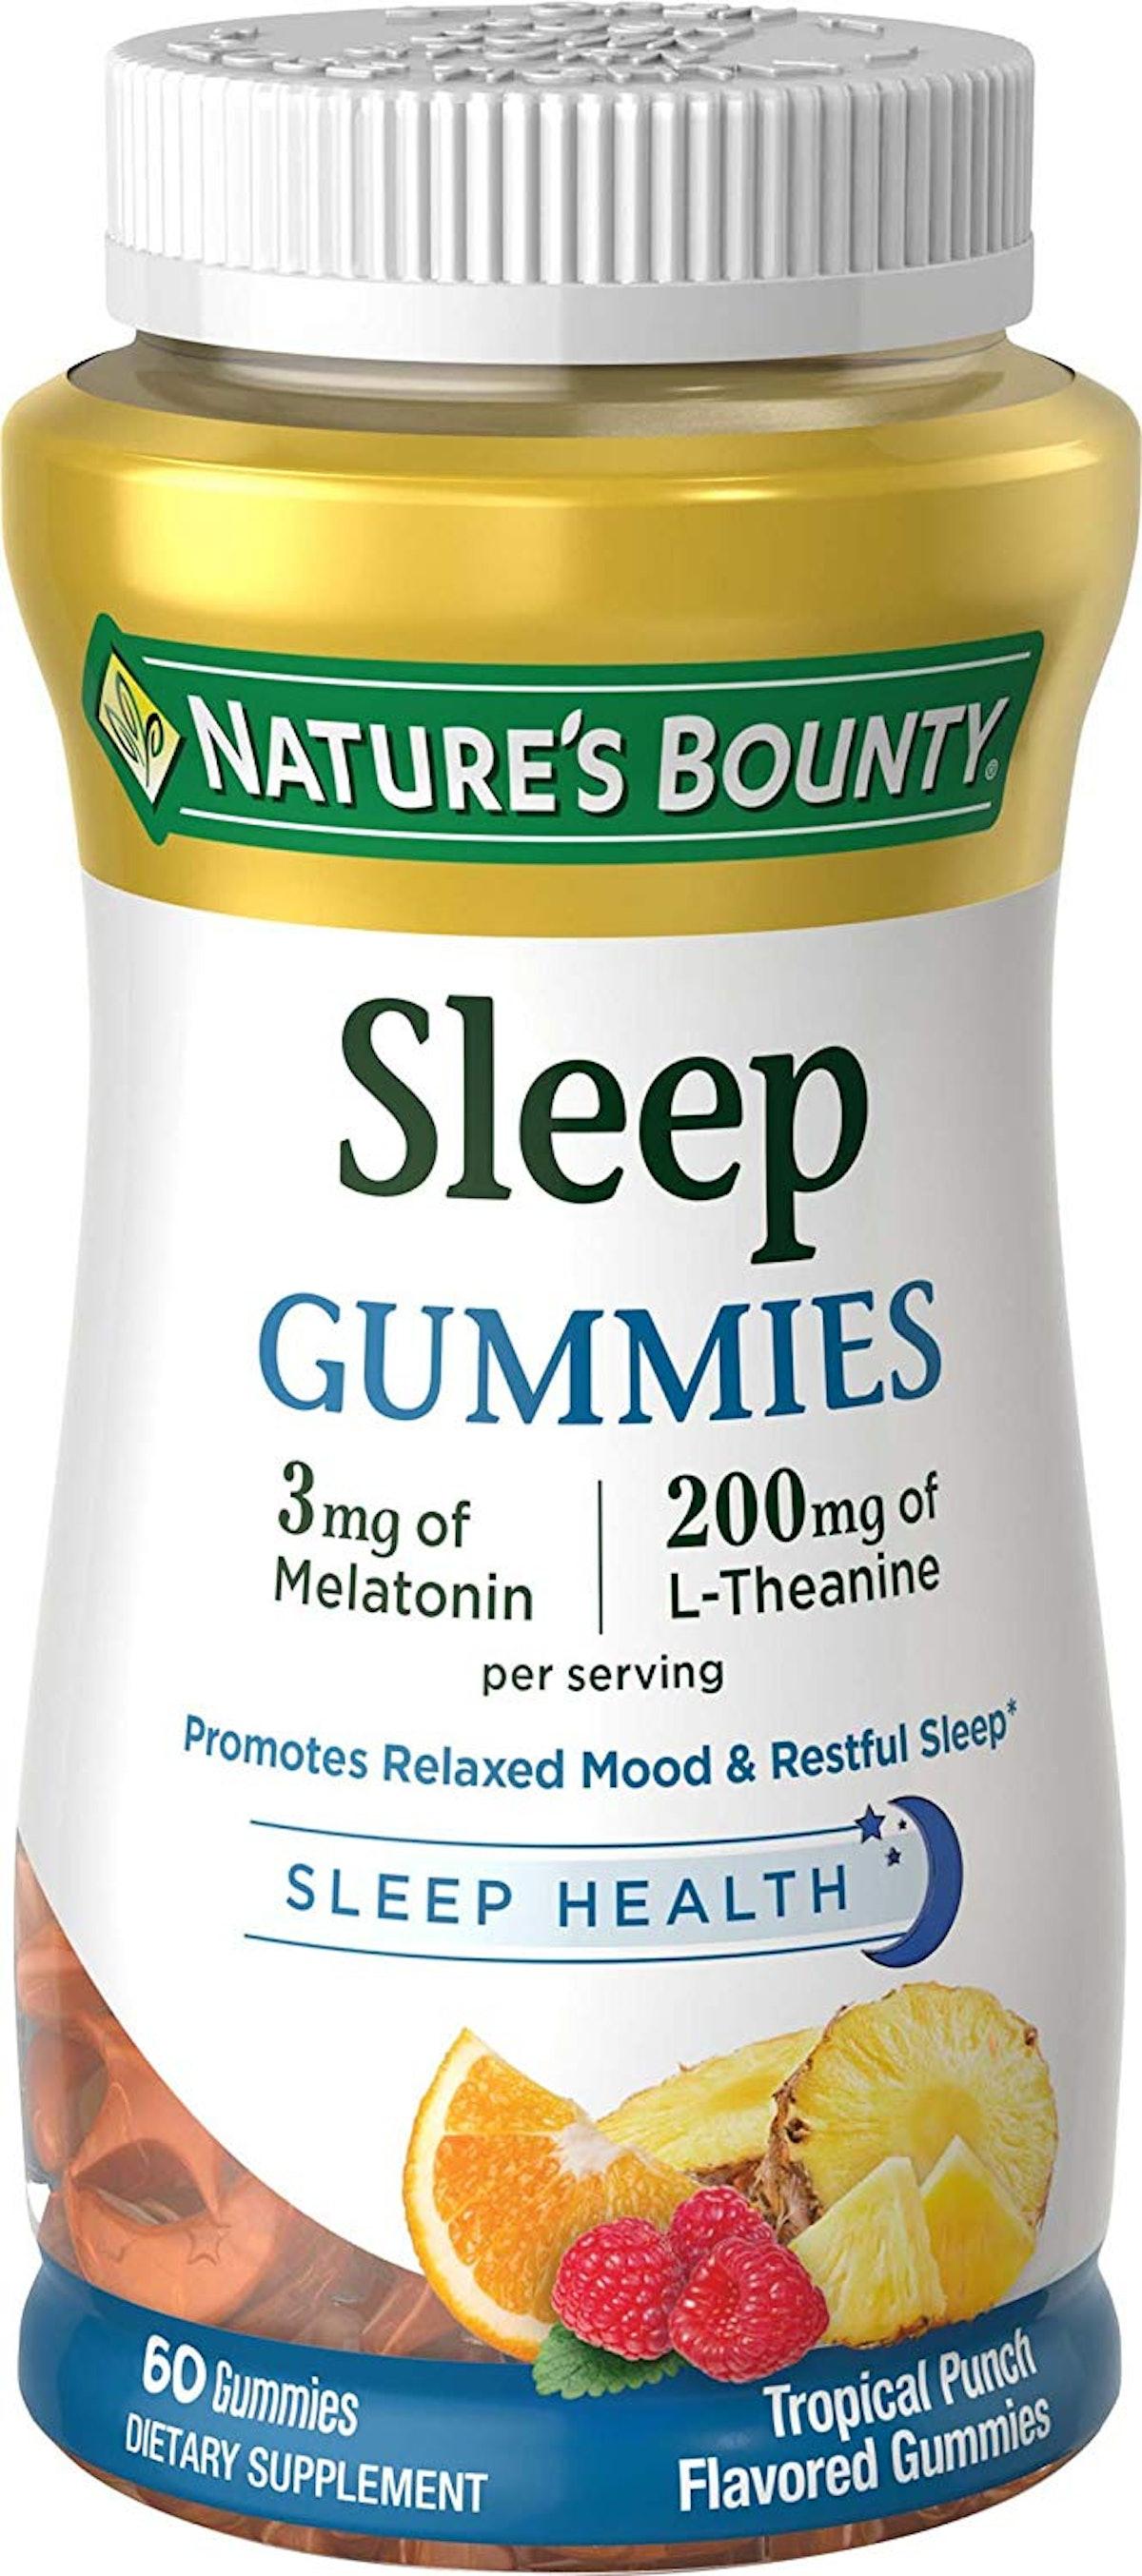 Nature's Bounty Sleep Gummies